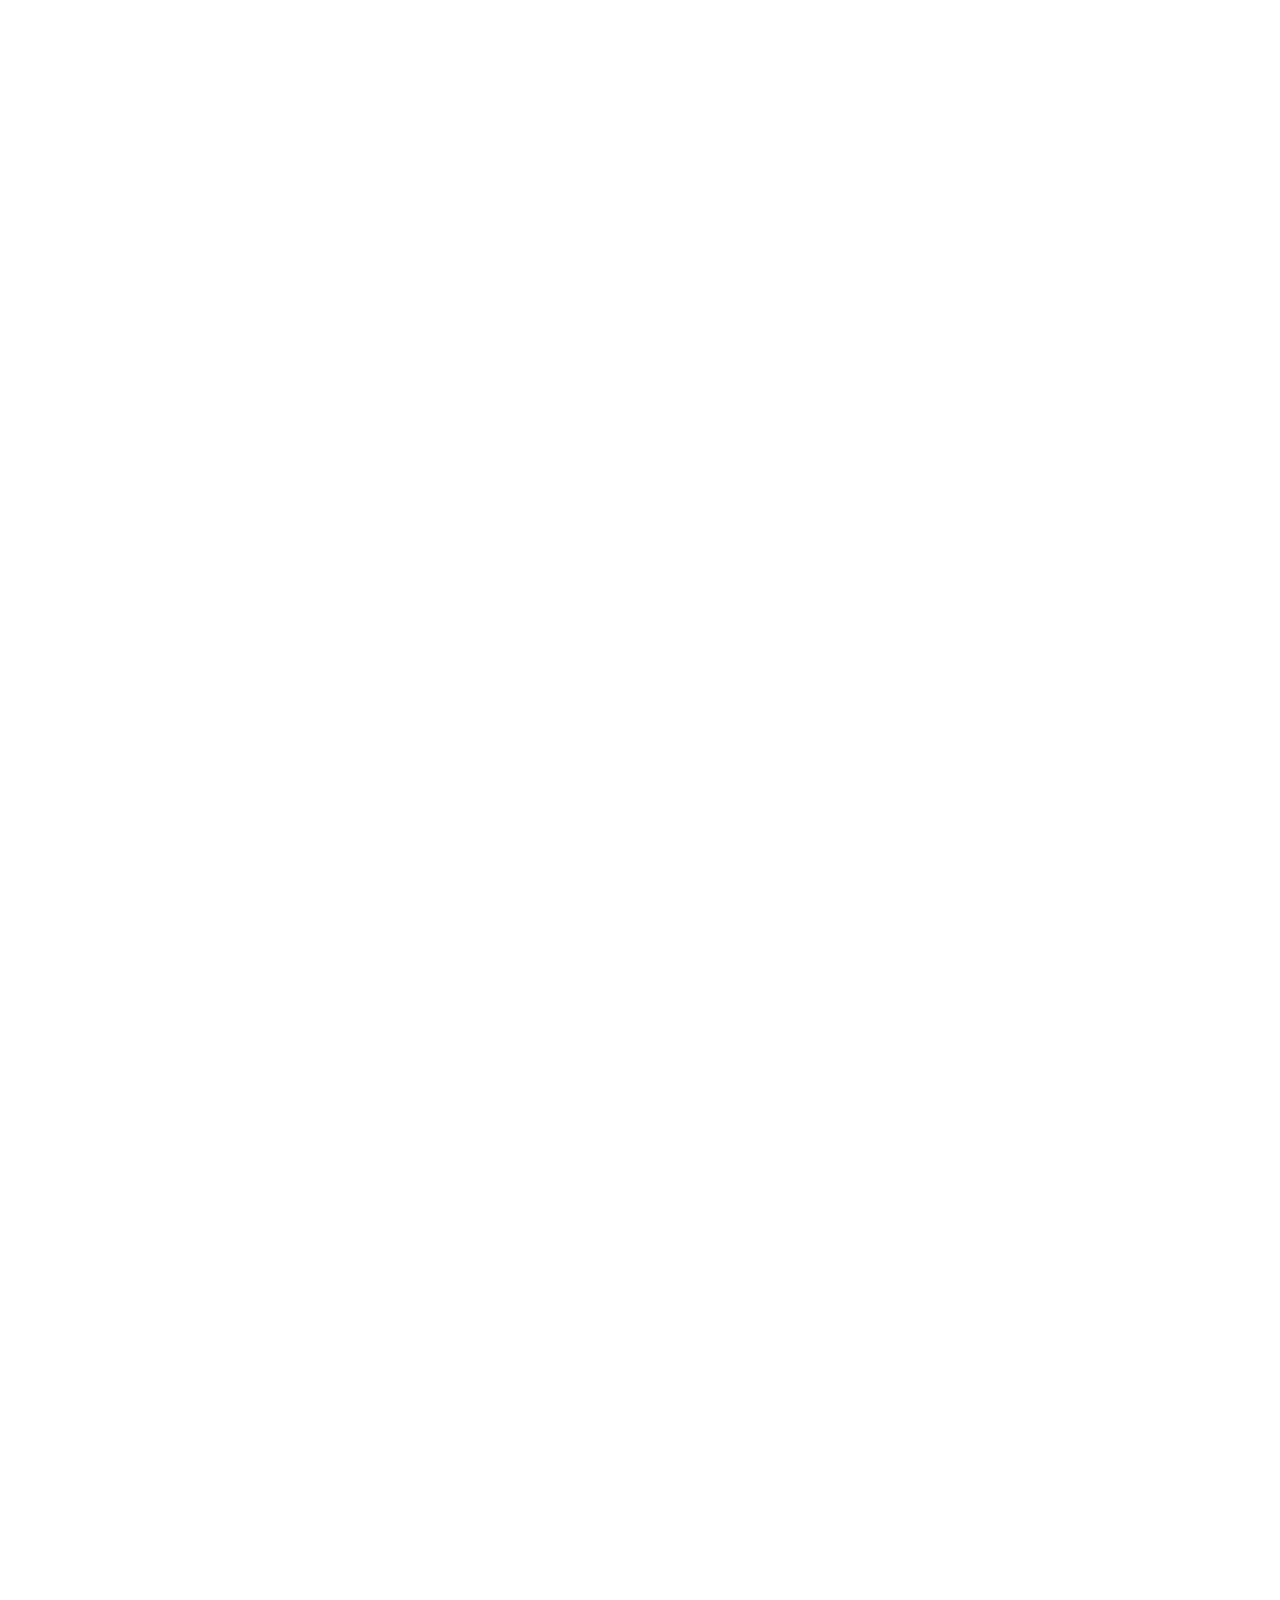 DAPHNE Standard Profile Arch Top 3/4's Lite Decorative Glass Double Iron Door – DAPHNE OID-6080-DAP1PAT